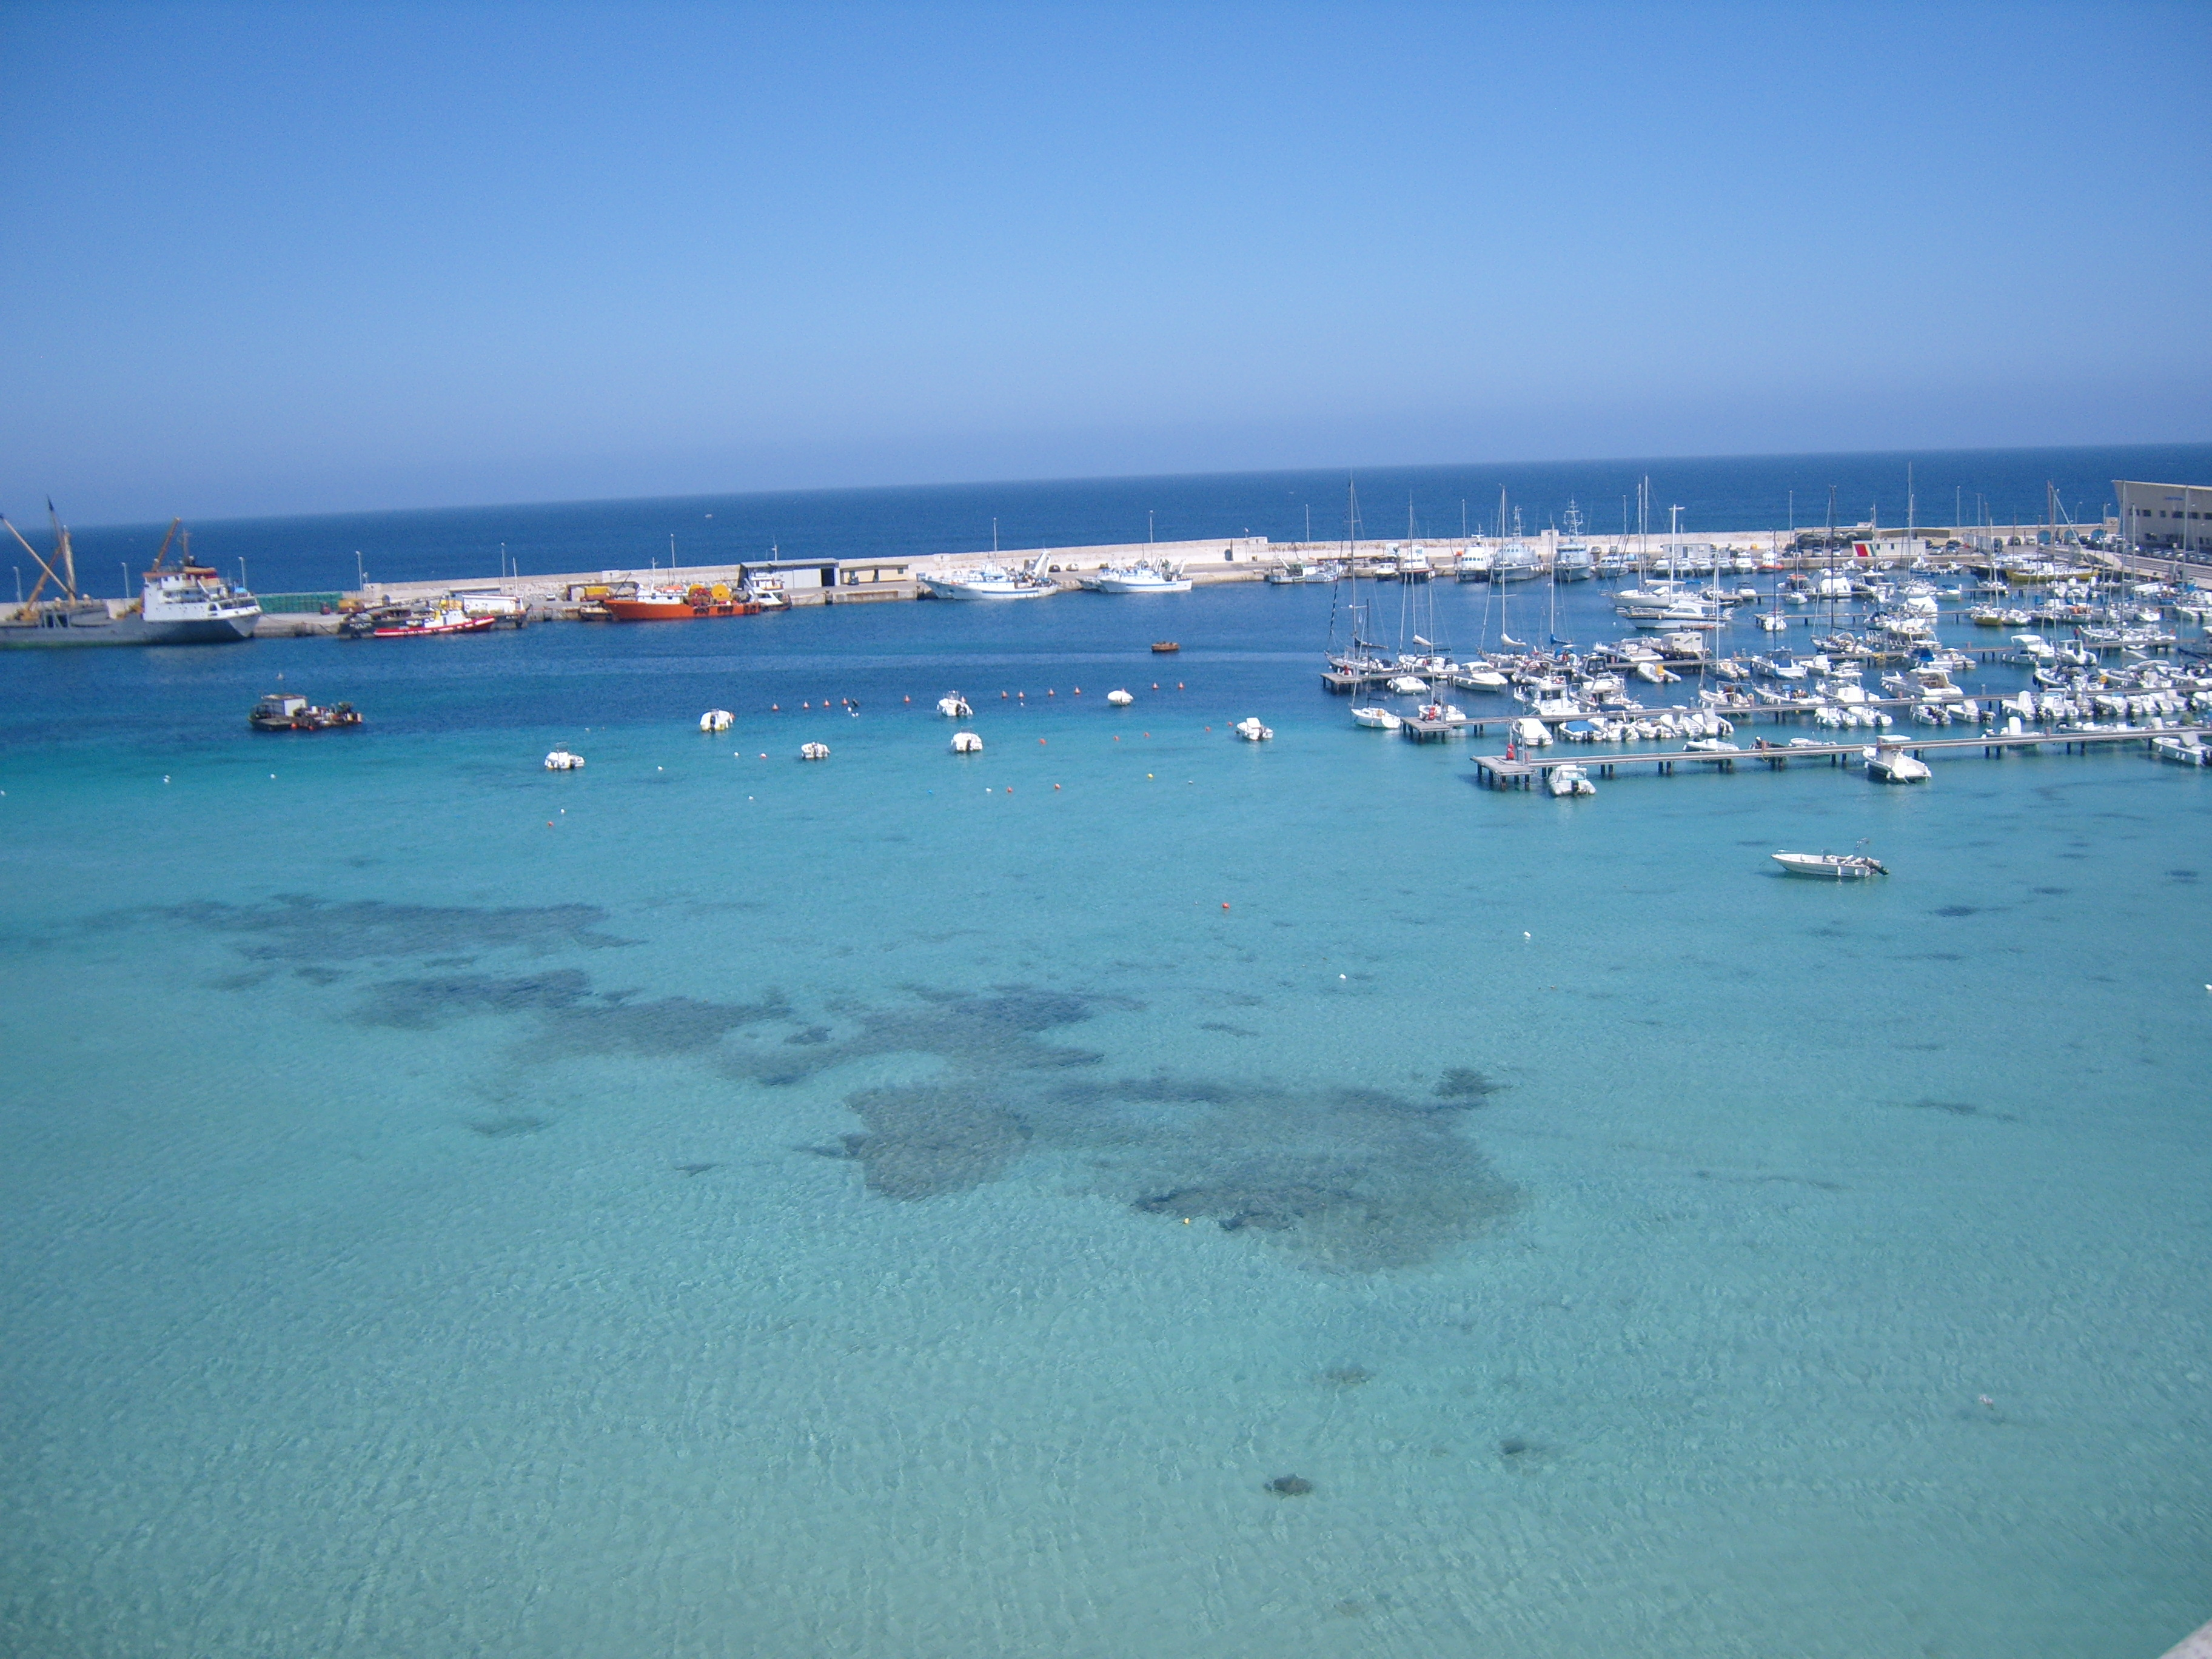 File:Otranto porto2.jpg - Wikimedia Commons